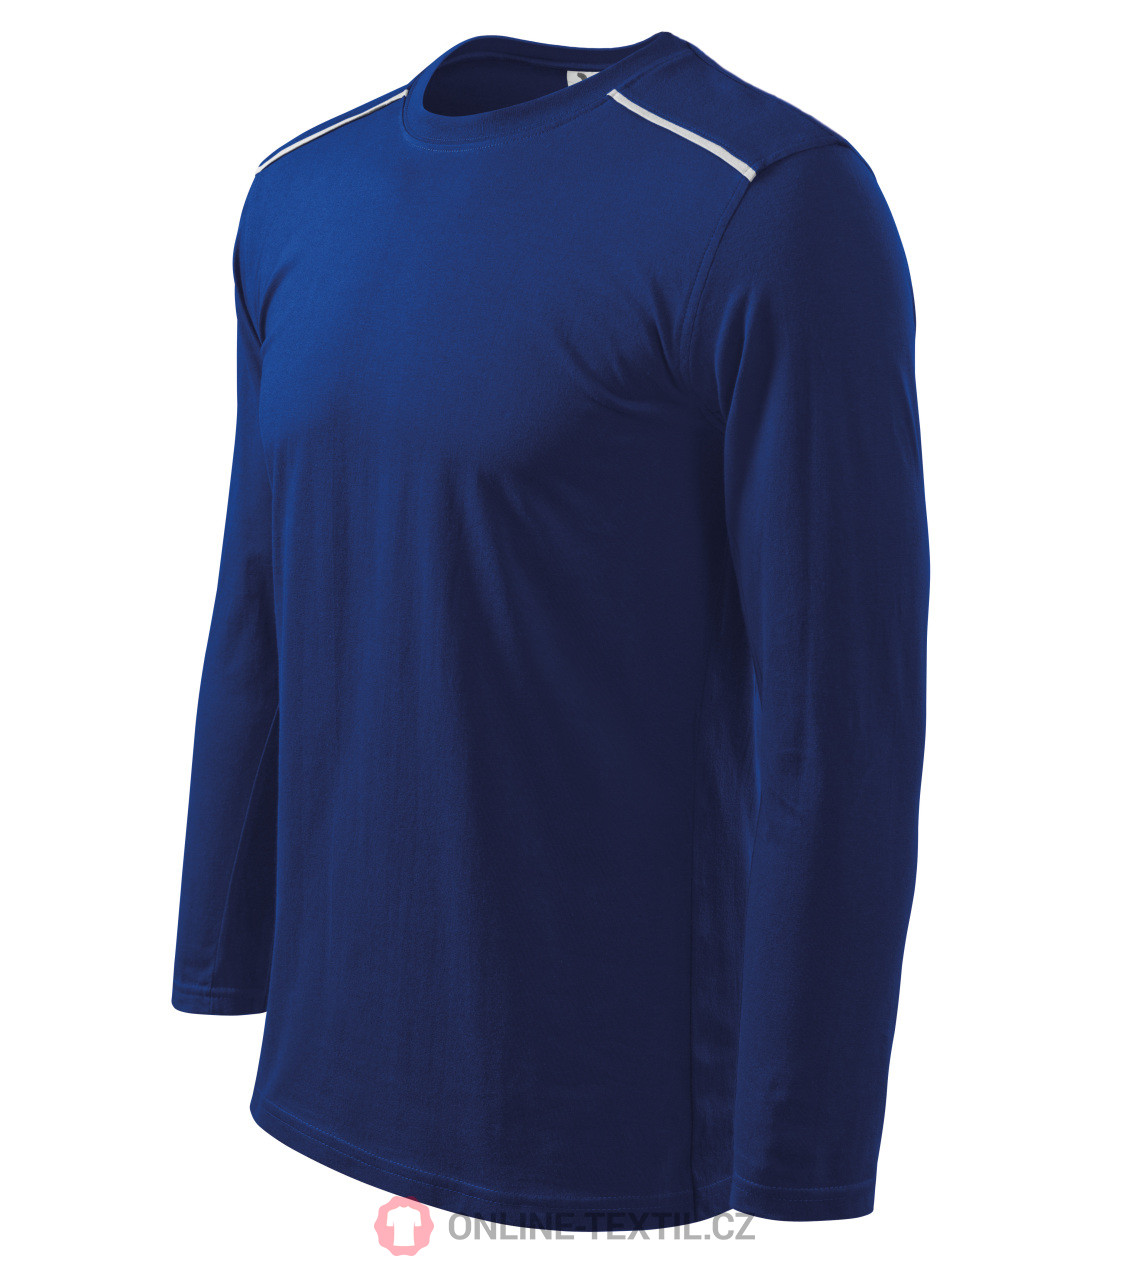 fb0dff8b70d03 ADLER CZECH Long Sleeve tričko unisex s dlhým rukávom vyššej gramáže ...